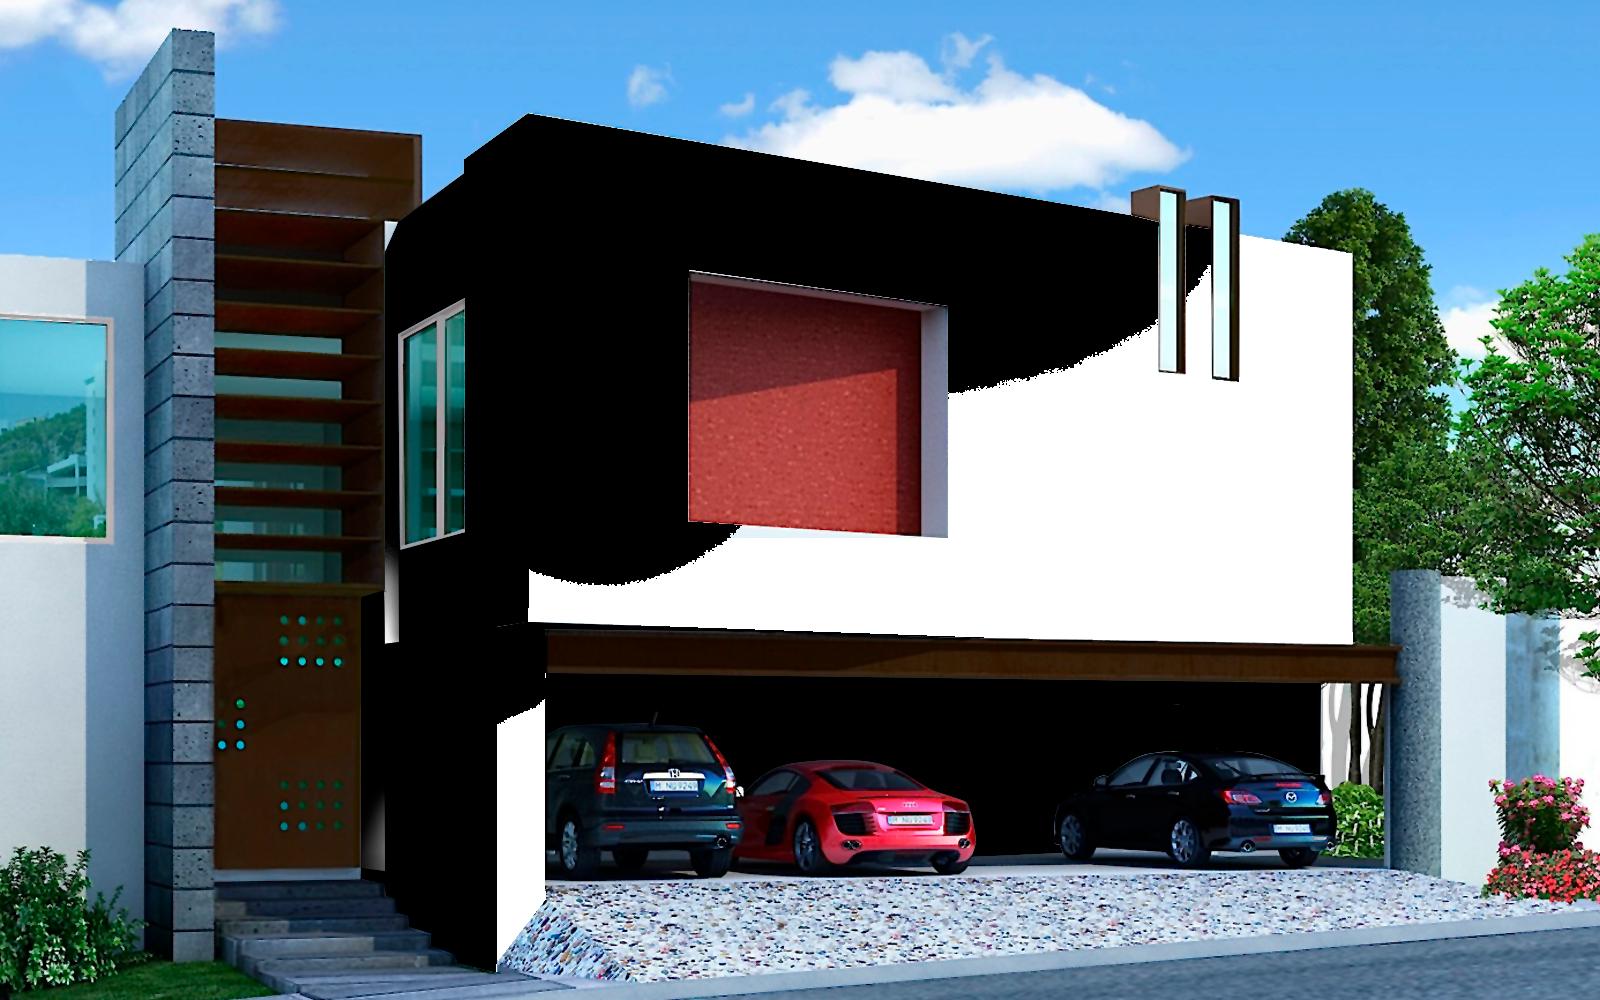 Como pintar una fachada great colores neutros para - Pintado de fachadas ...